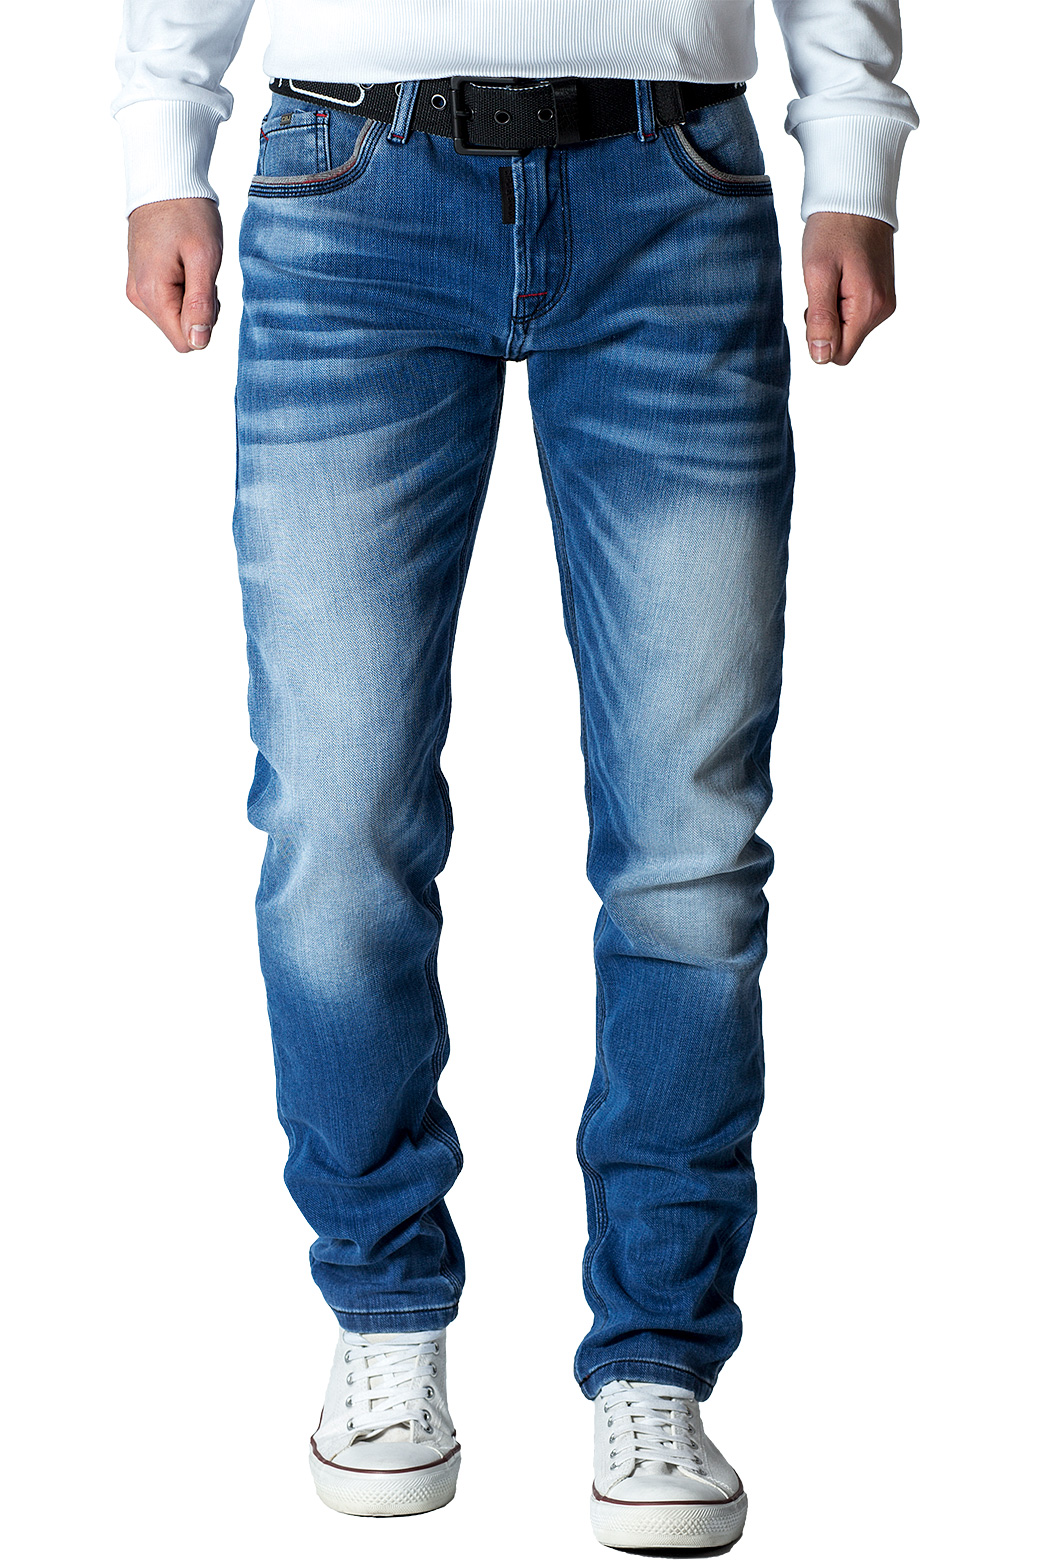 Cipo-amp-Baxx-Uomo-Jeans-Pantaloni-ricamate-Biker-Style-streetwear-nervature-pattern-Dope miniatura 19